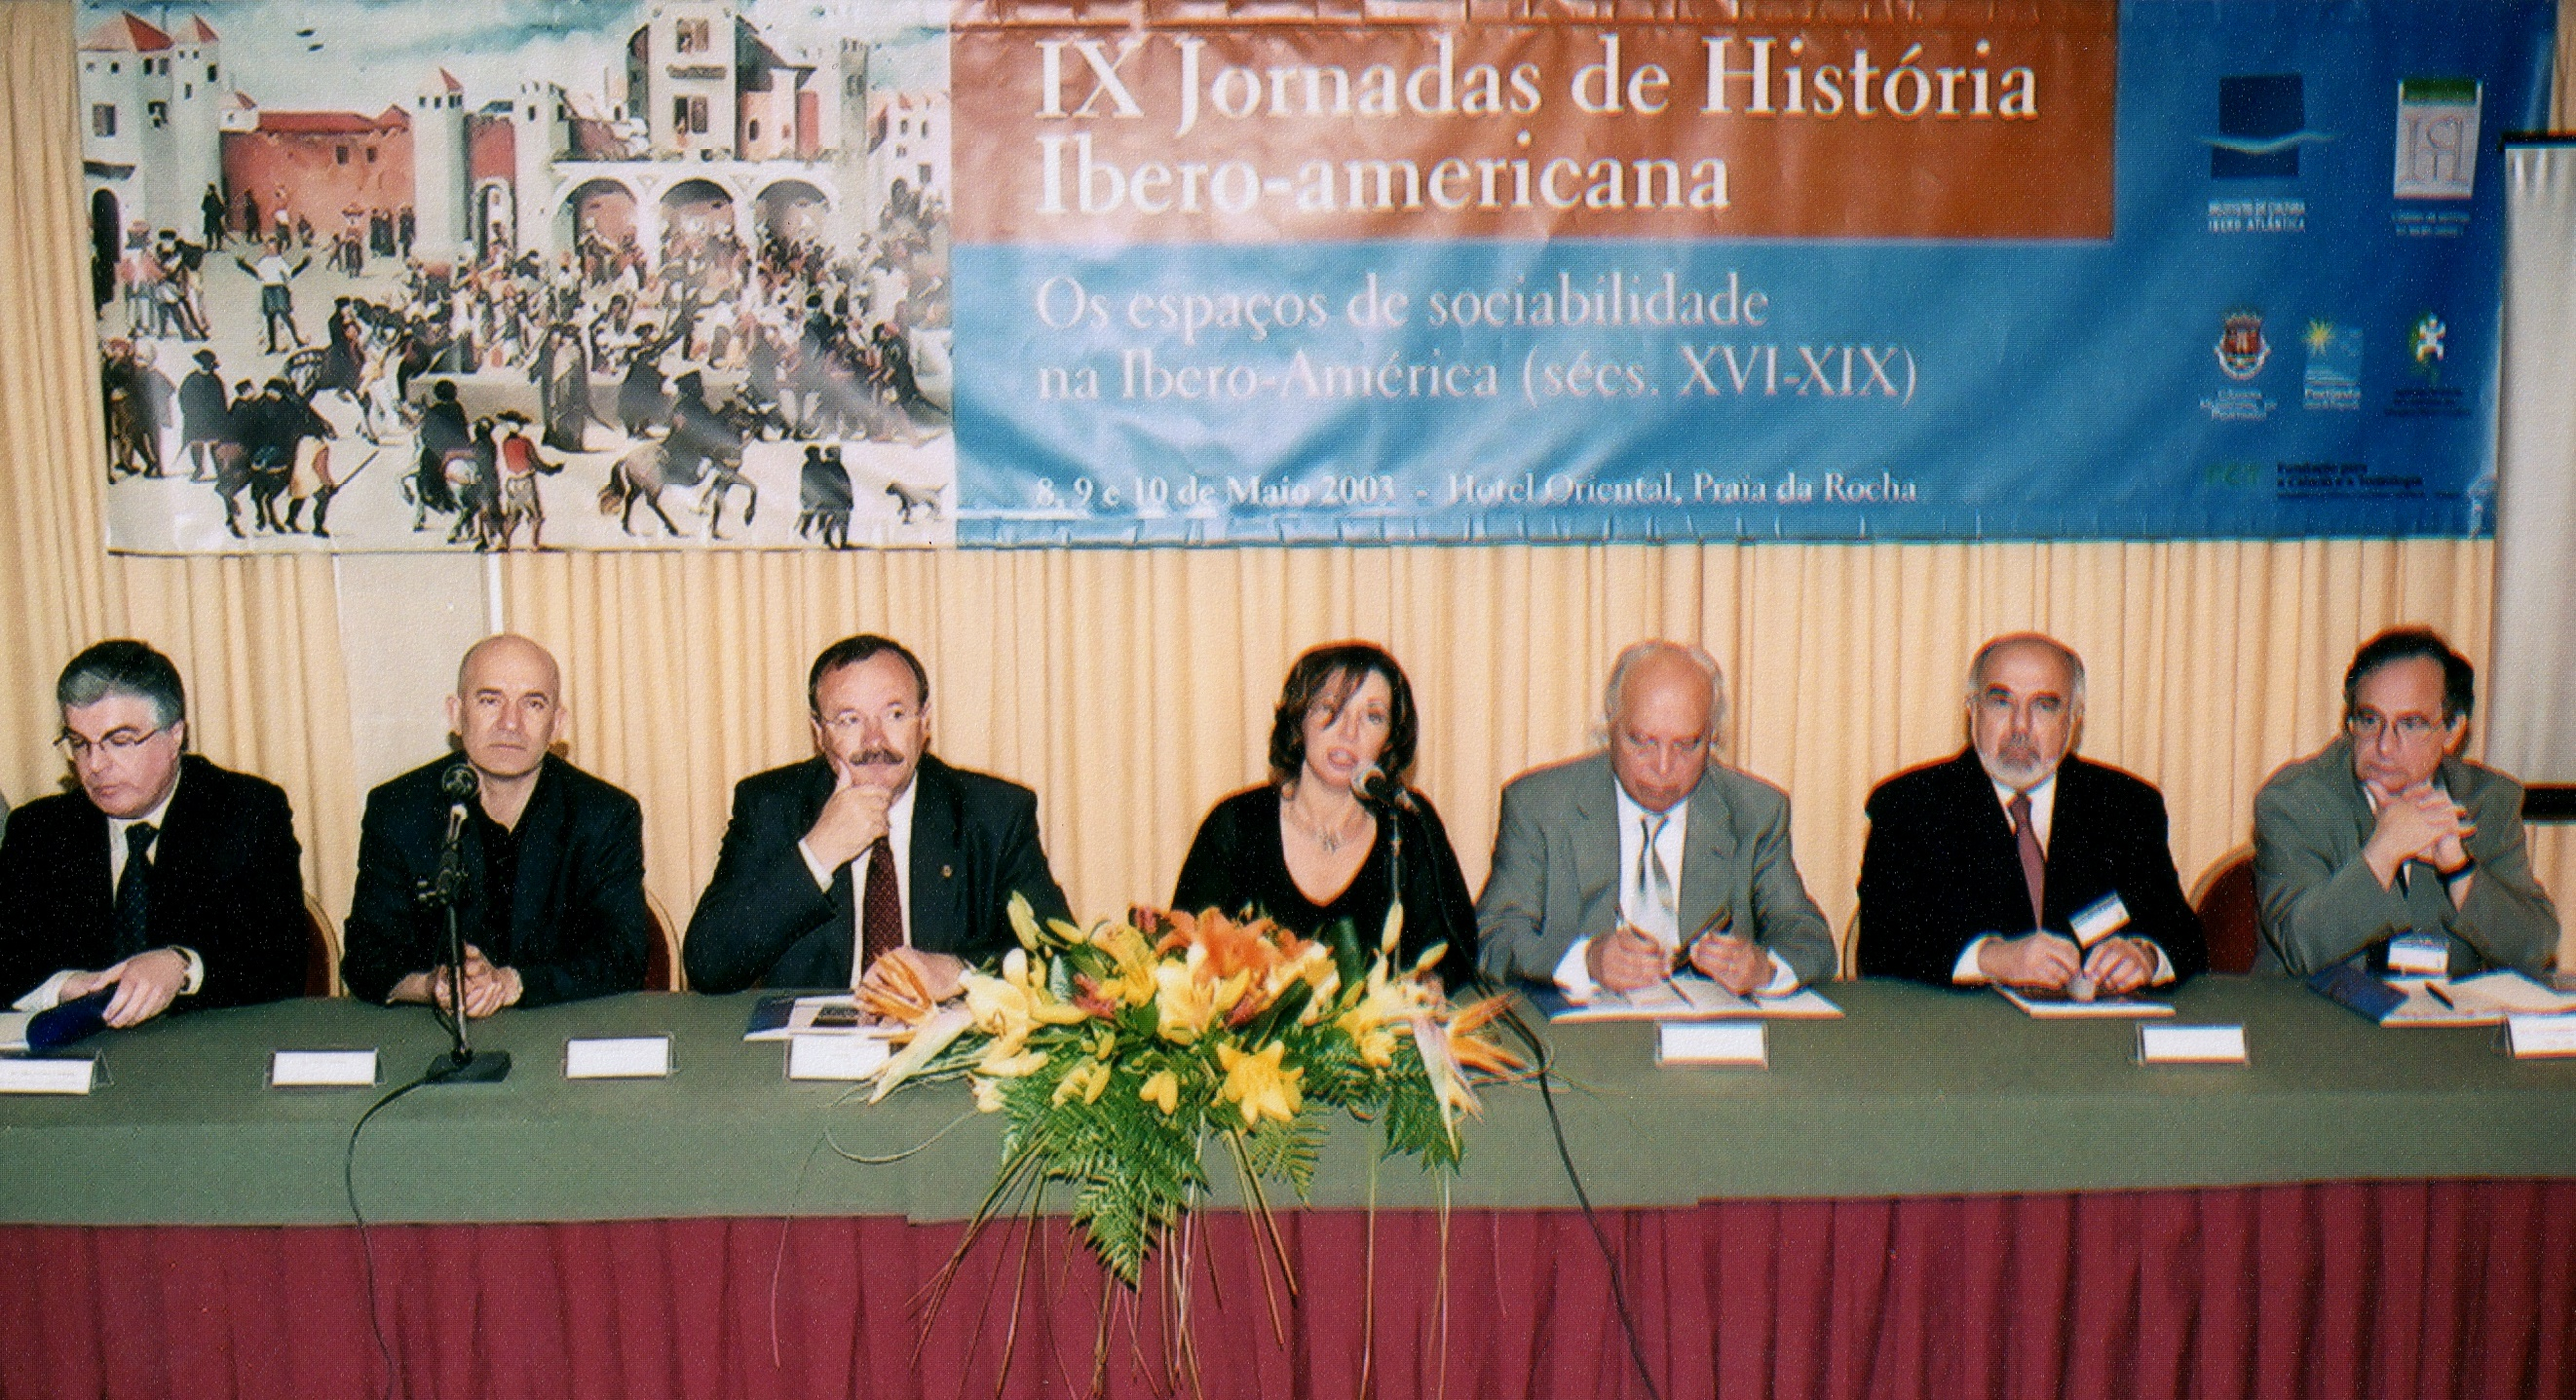 IX Jornadas História Ibero-americana